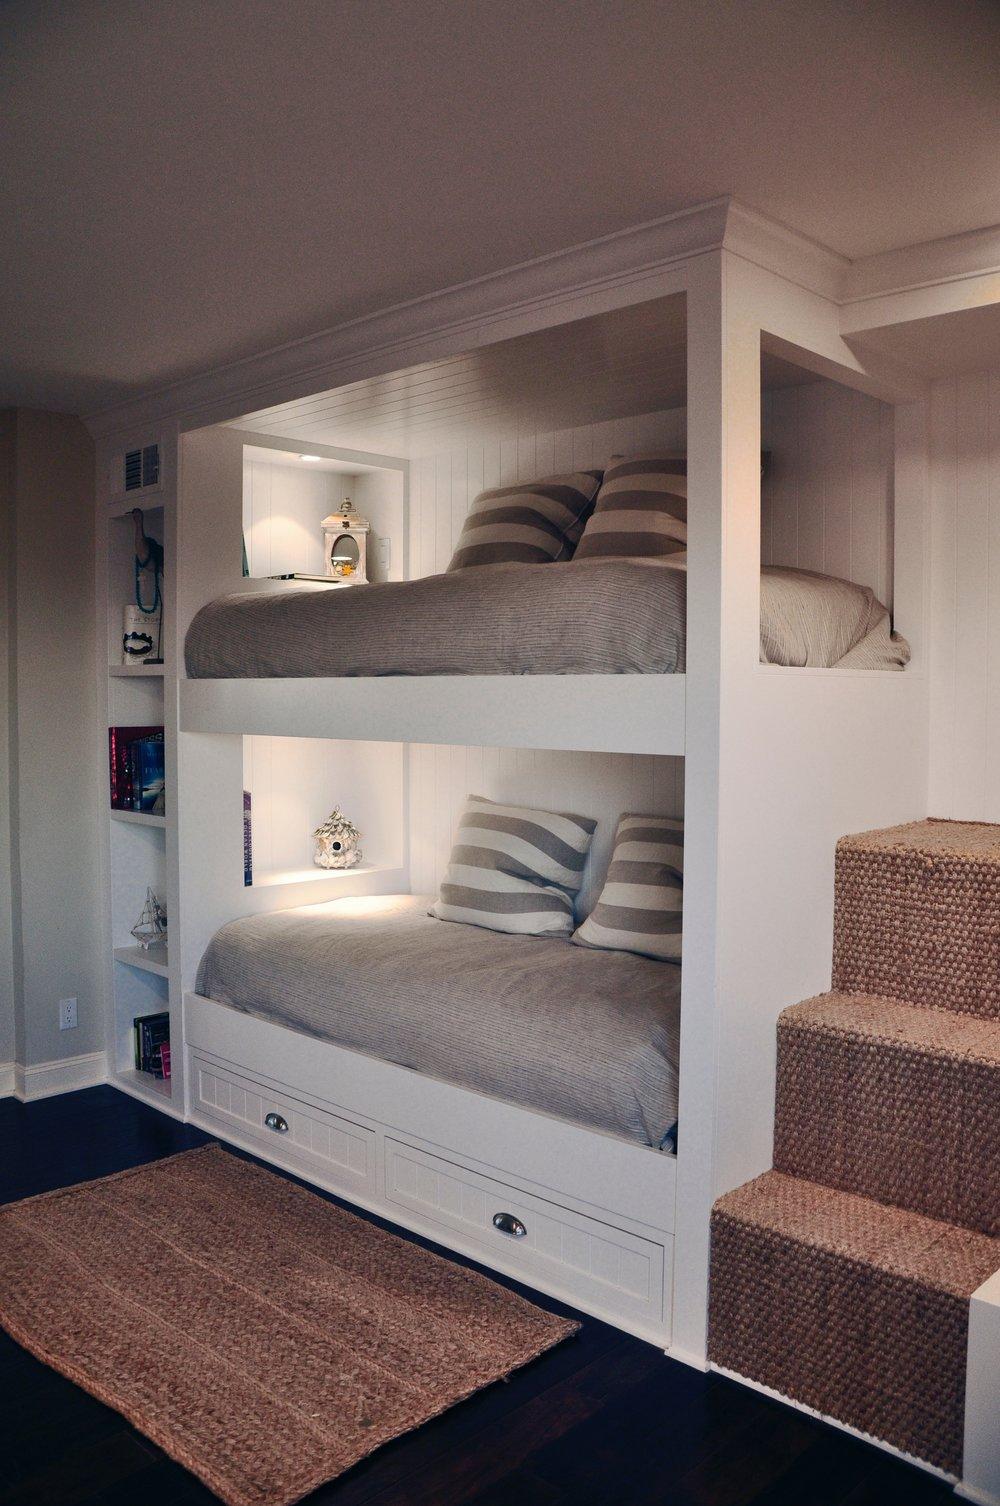 Bunk Bed A - 01.jpg